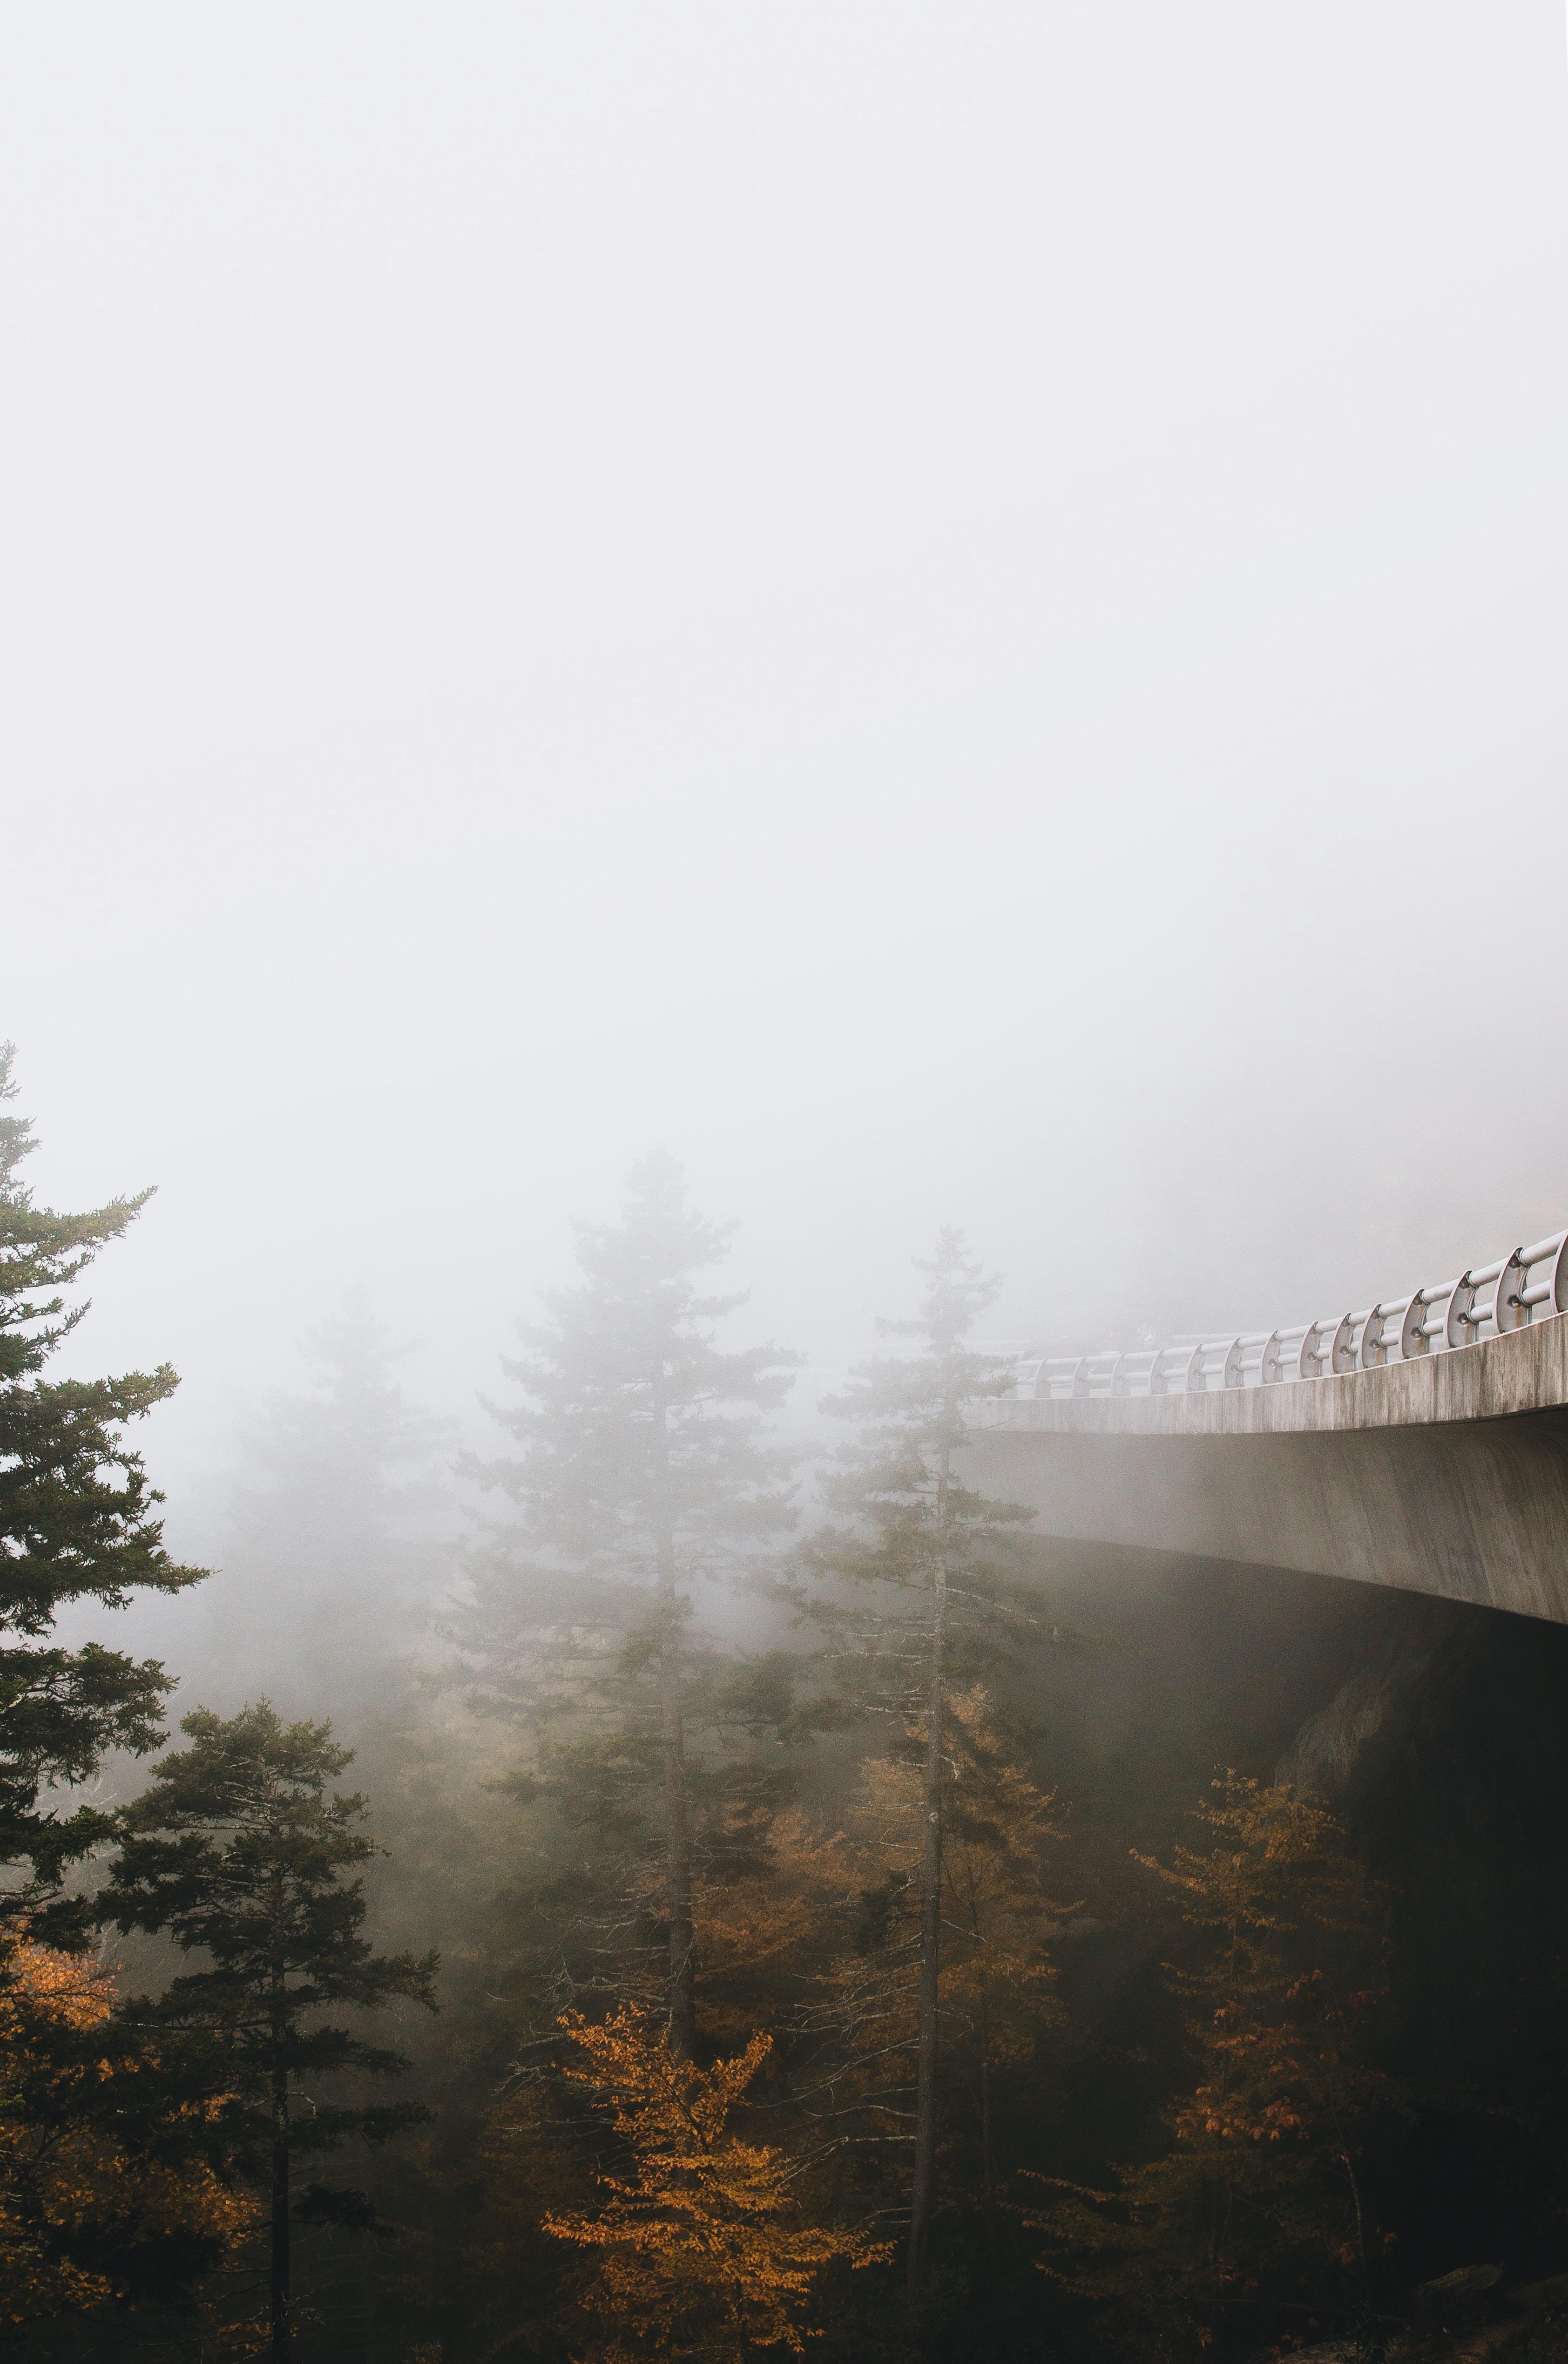 Concrete bridge over foggy forest pines